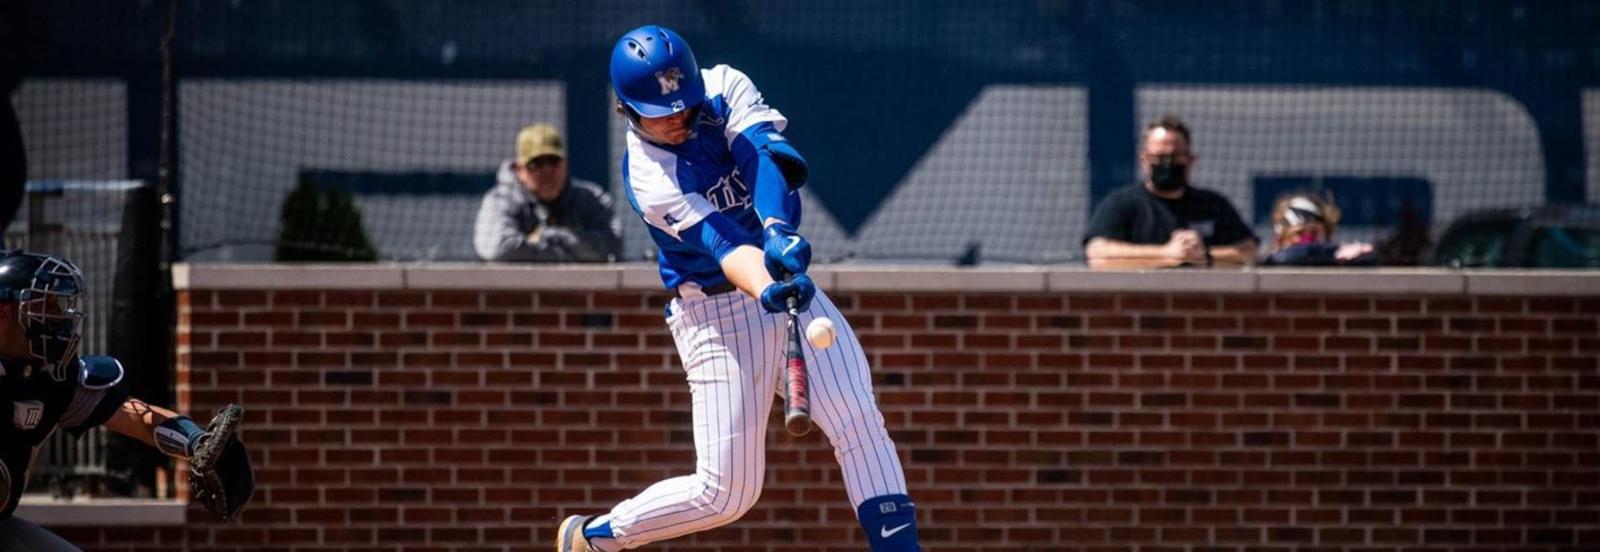 Alec Trela hitting a baseball with baseball bat